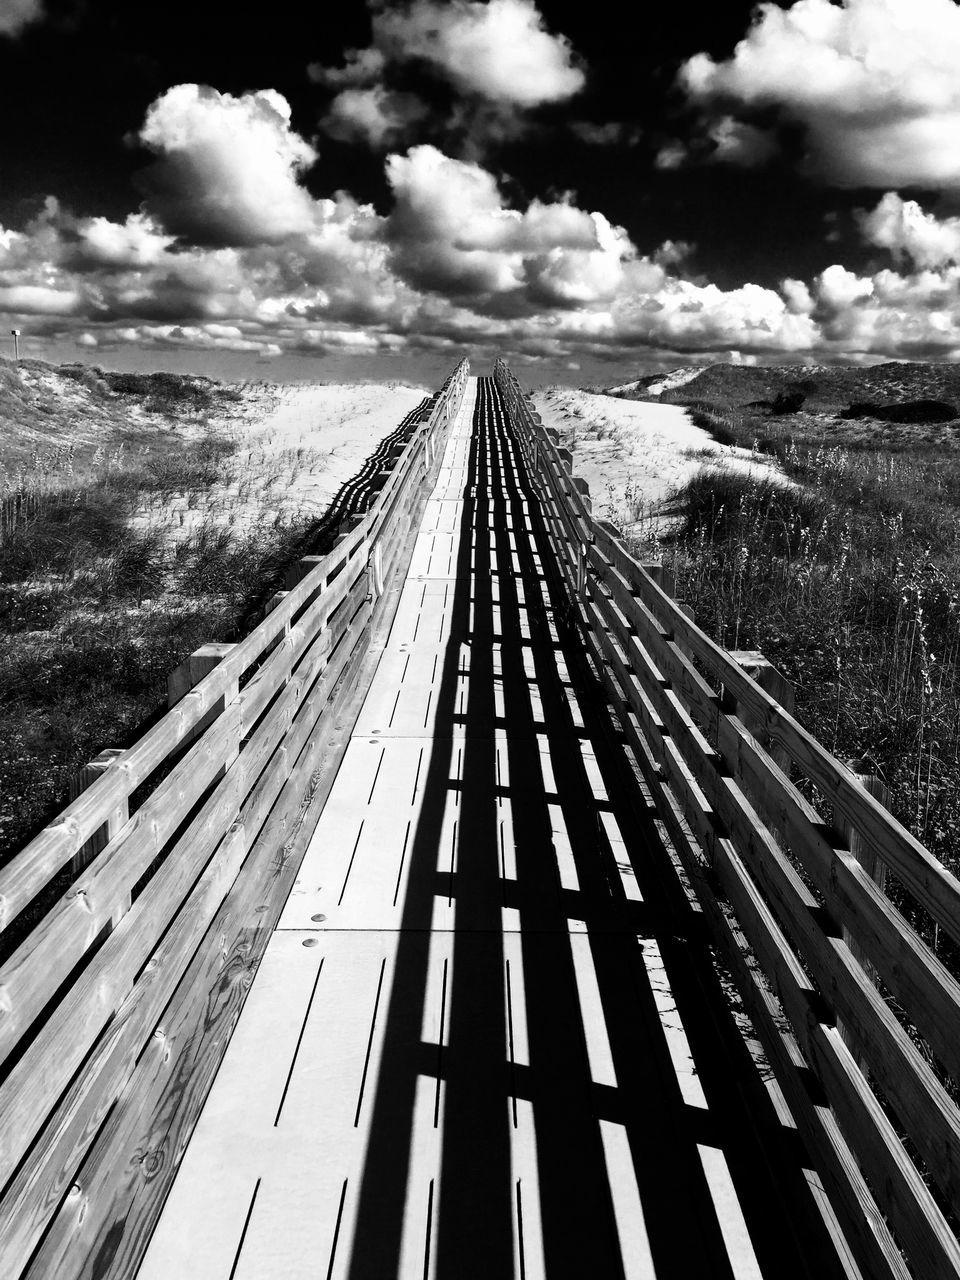 Boardwalk Leading Towards Beach On Sunny Day